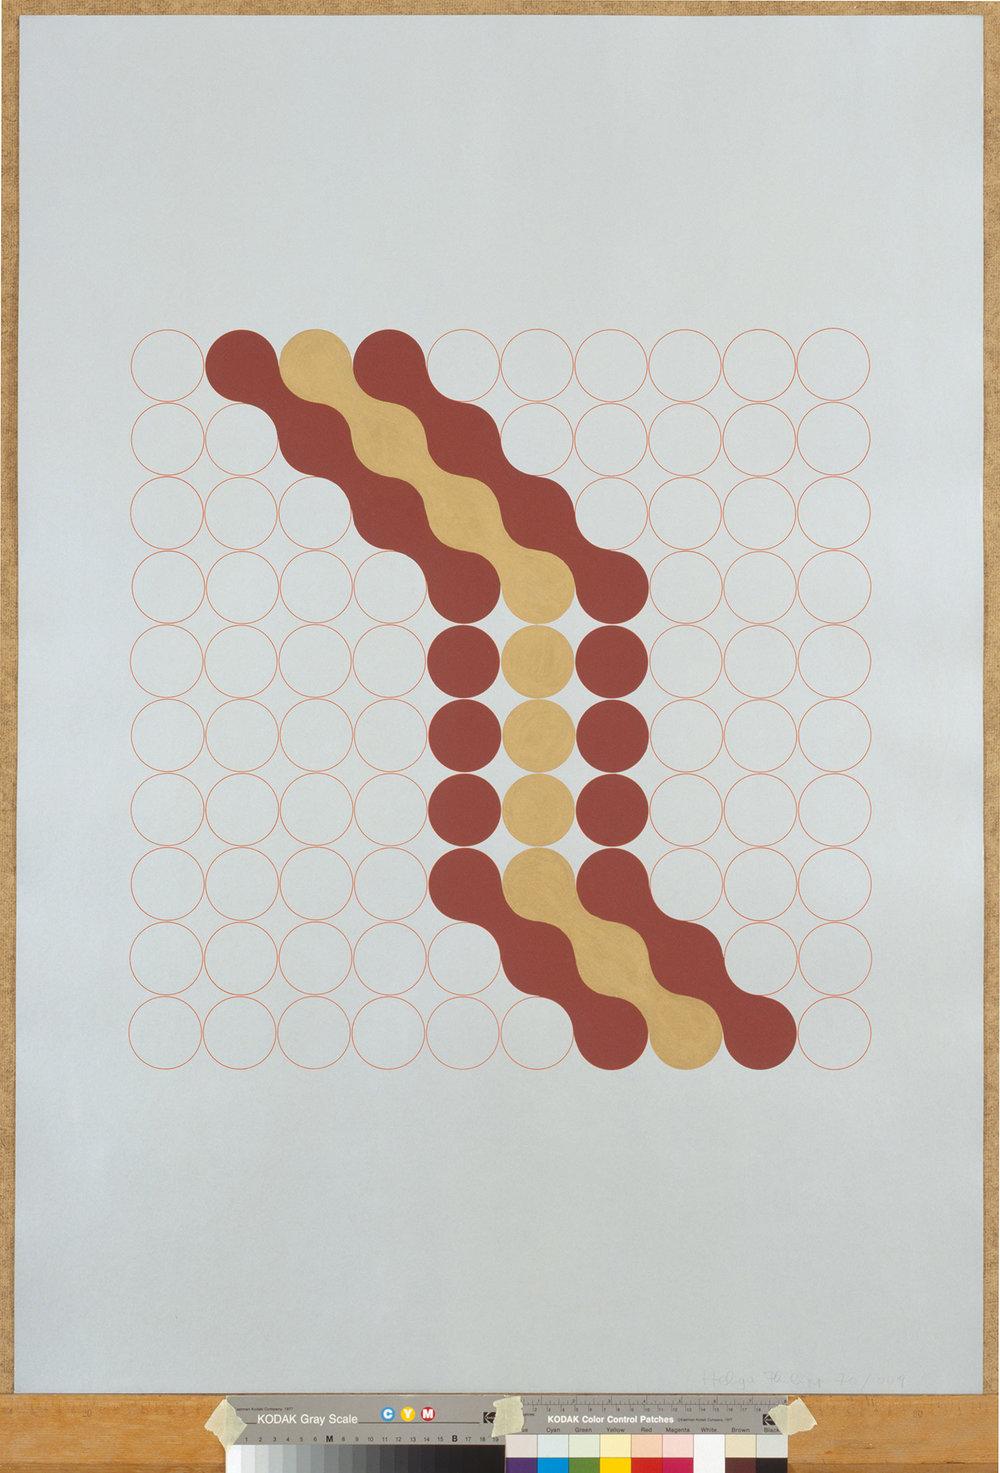 HELGA PHILIPP  OHNE TITEL (D17), 1970 Gouache auf Siebdruck, 100 x 70 cm  Photo: Nachlass Helga Philipp